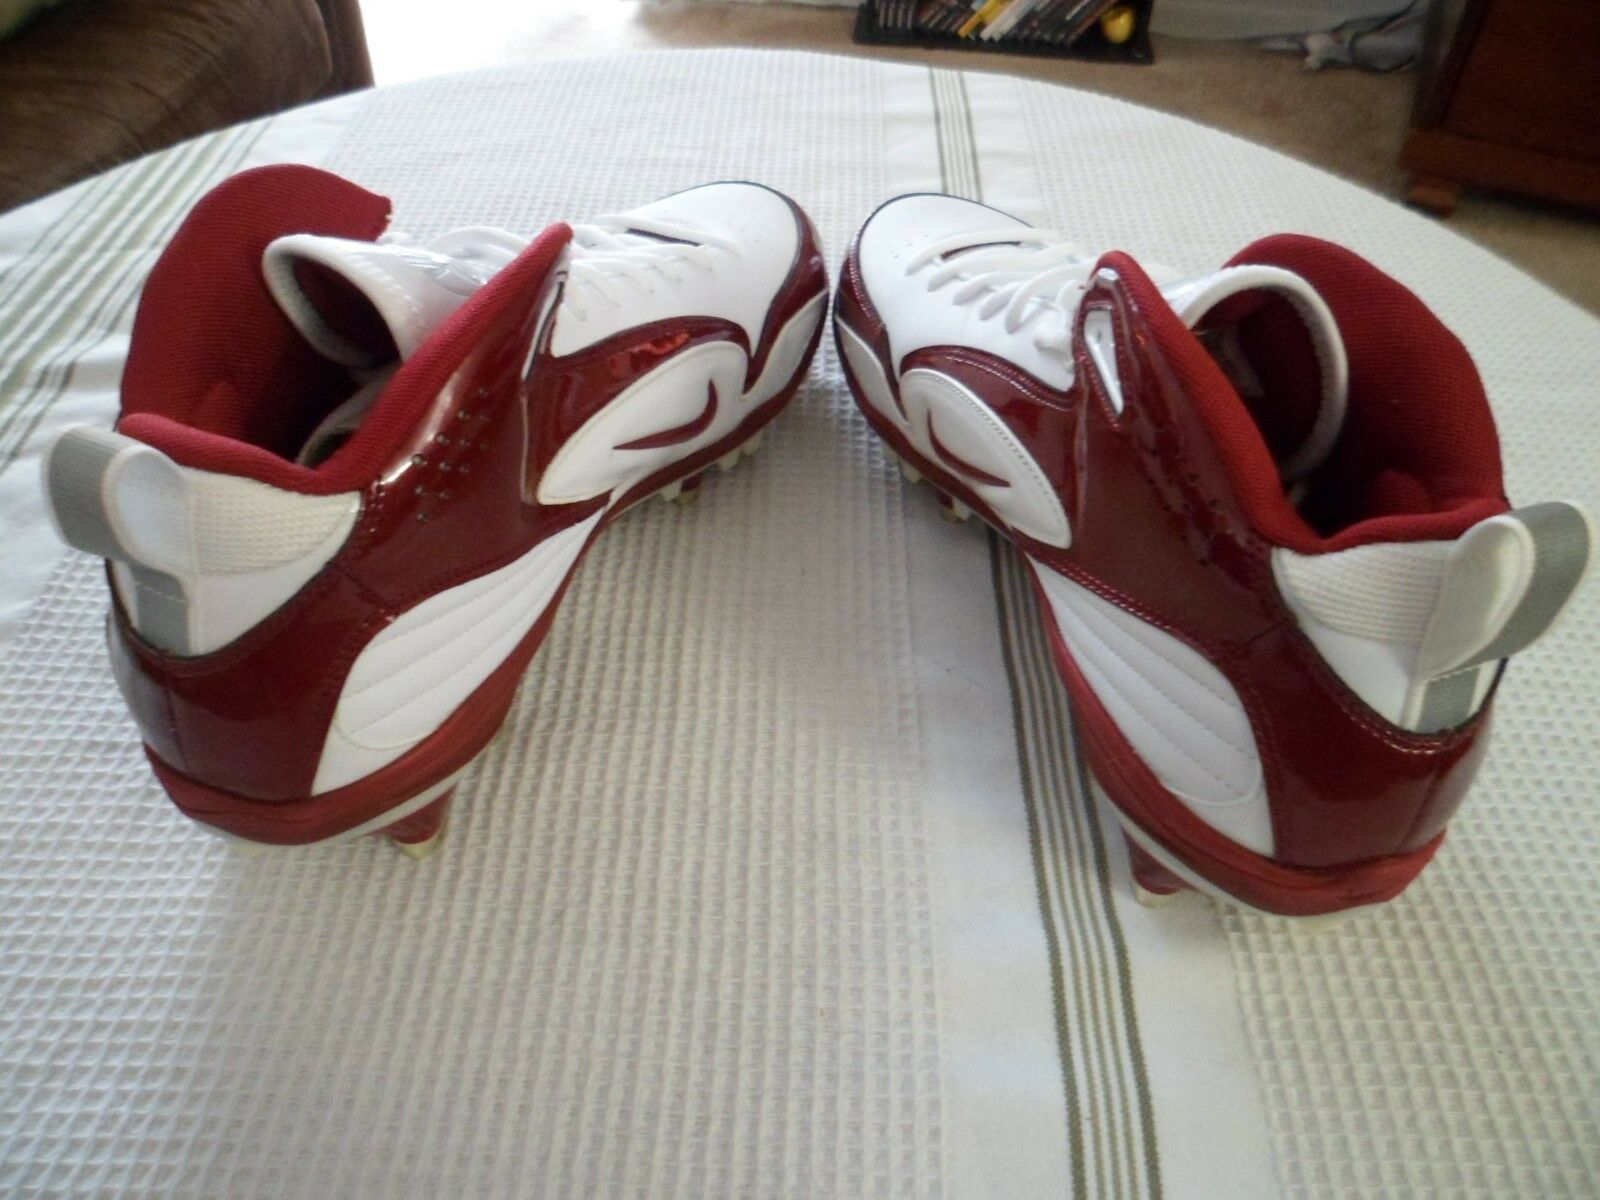 huge discount 12056 6b5f0 ... Nike Zoom Merciless Pro Shark TD Football Football Football Cleats NEW  sz12 ~354905-162 ...